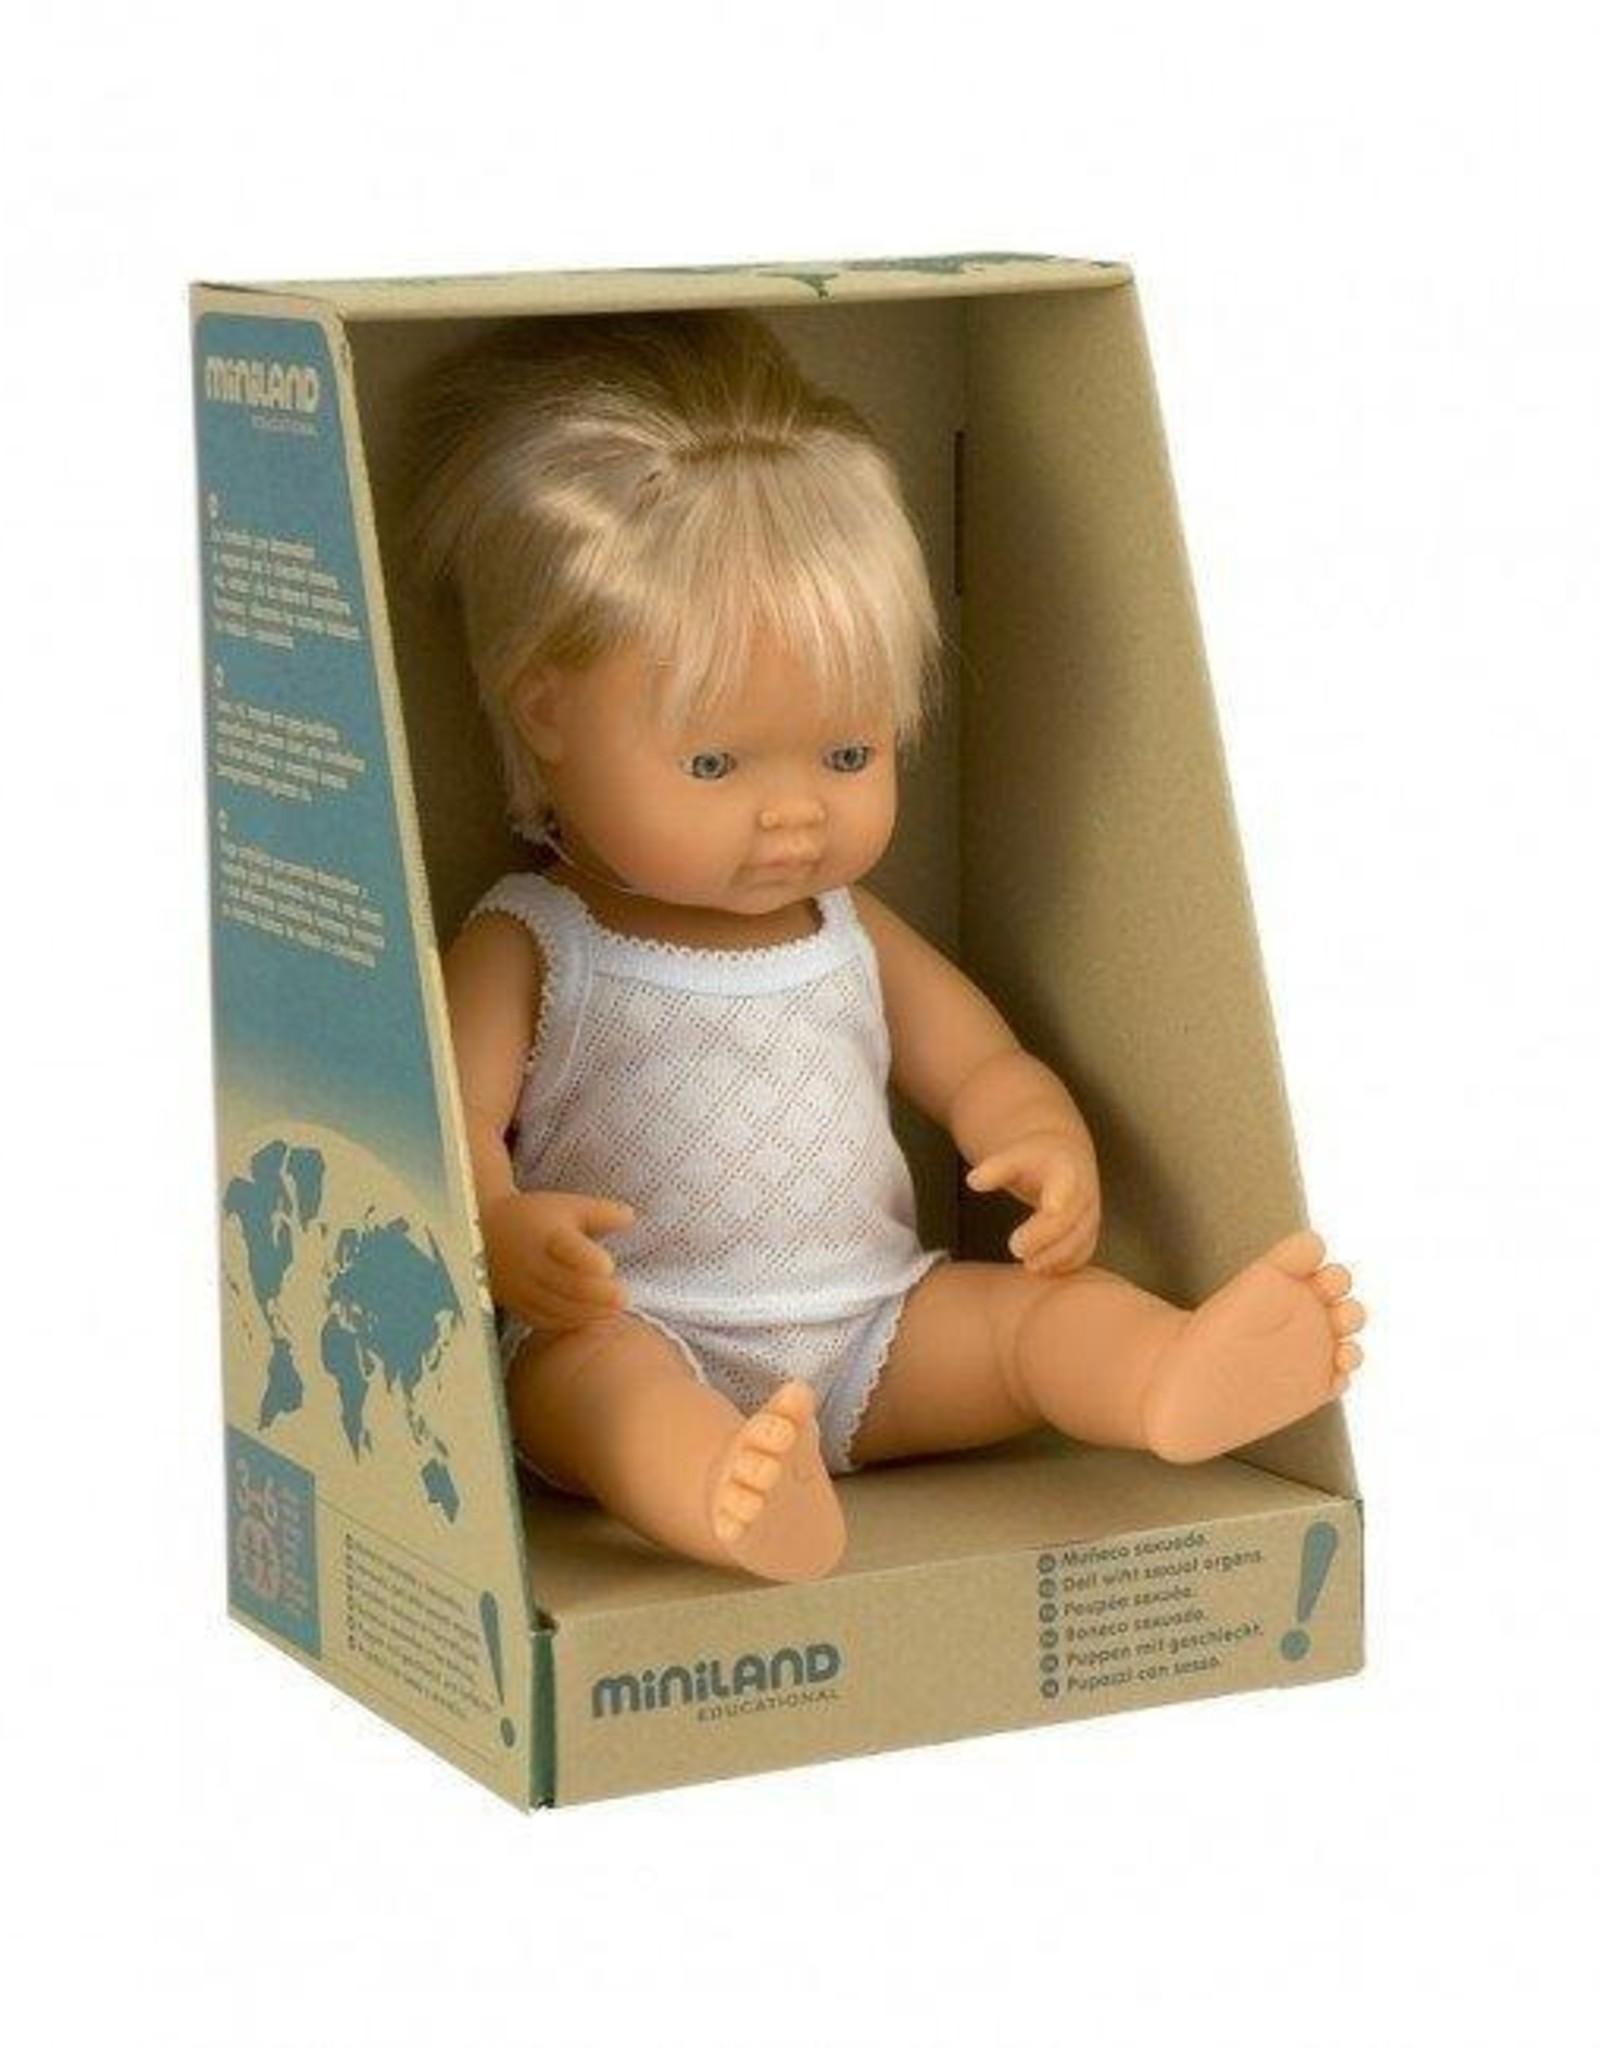 Miniland Miniland Baby Doll 38cm - Caucasian Boy